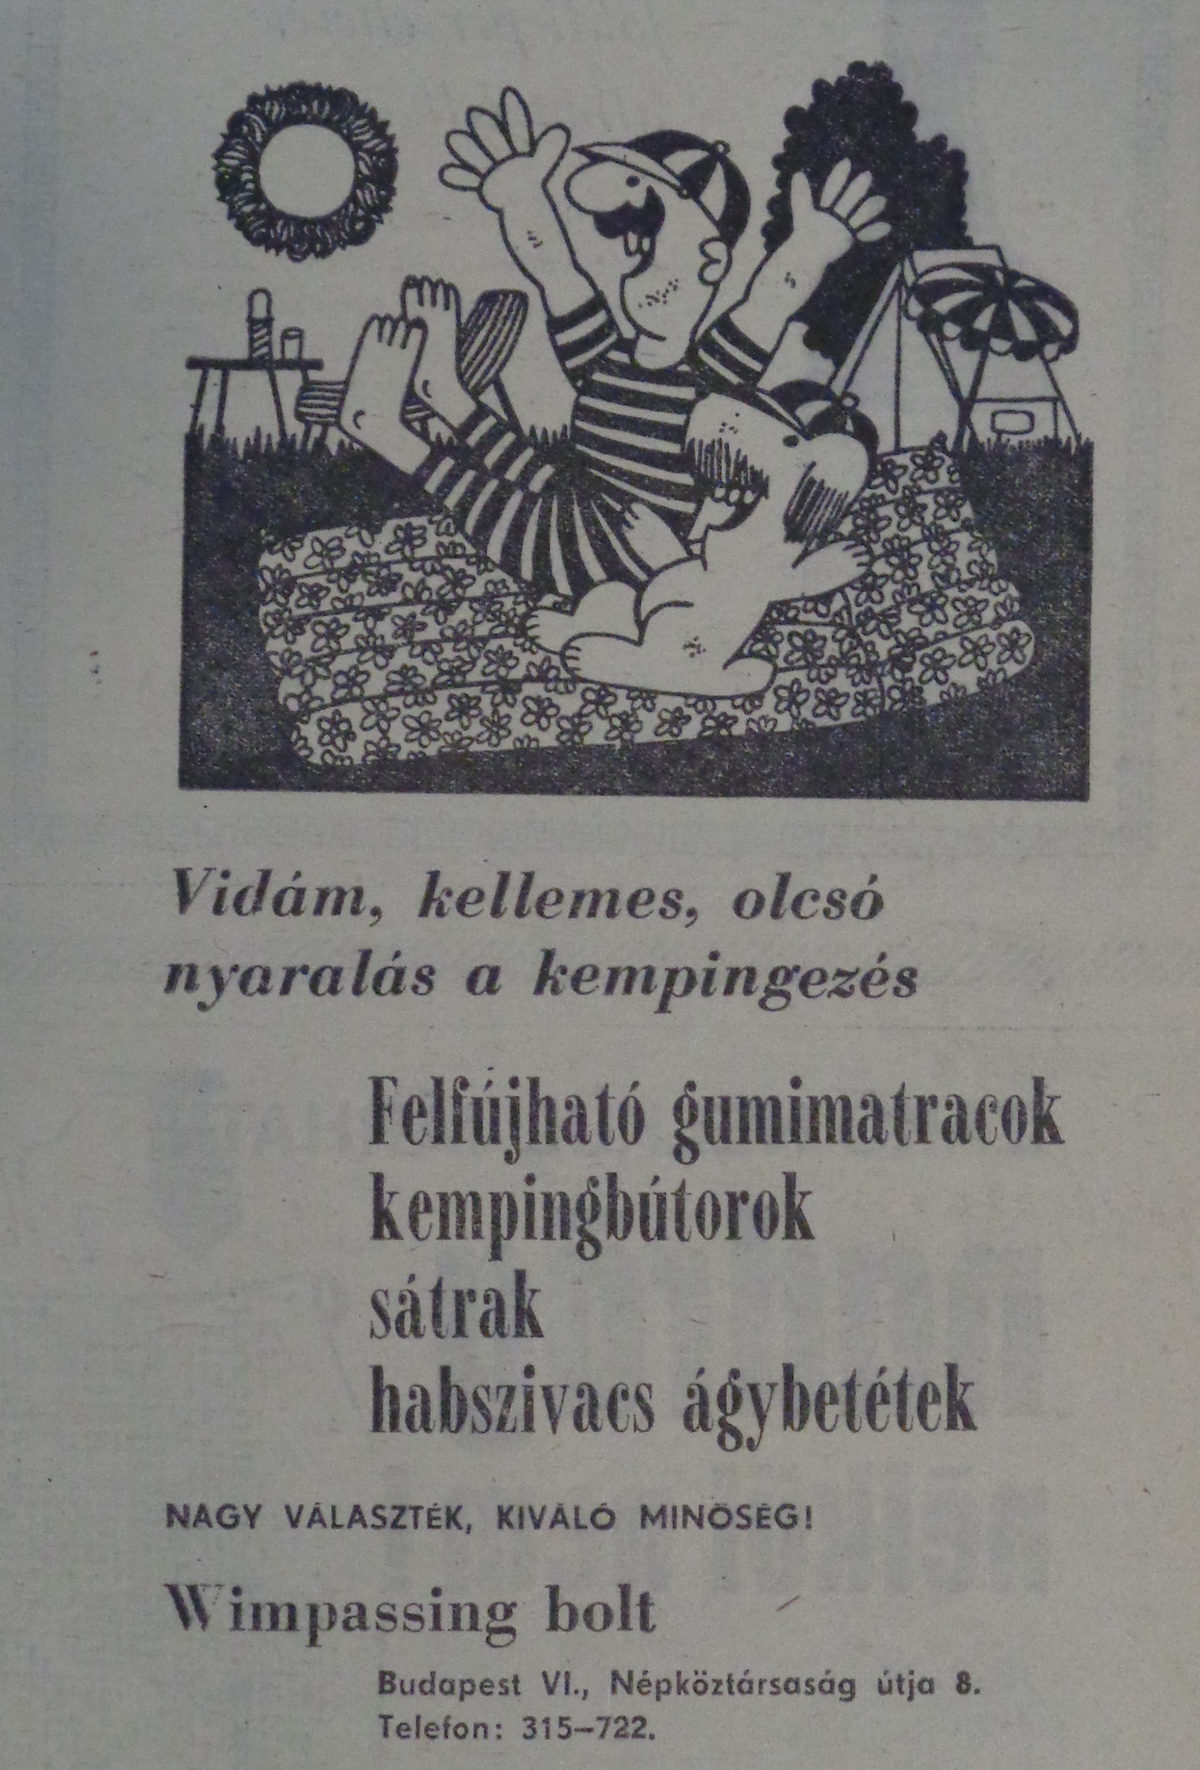 kemping-197006-nepszabadsaghirdetes.jpg